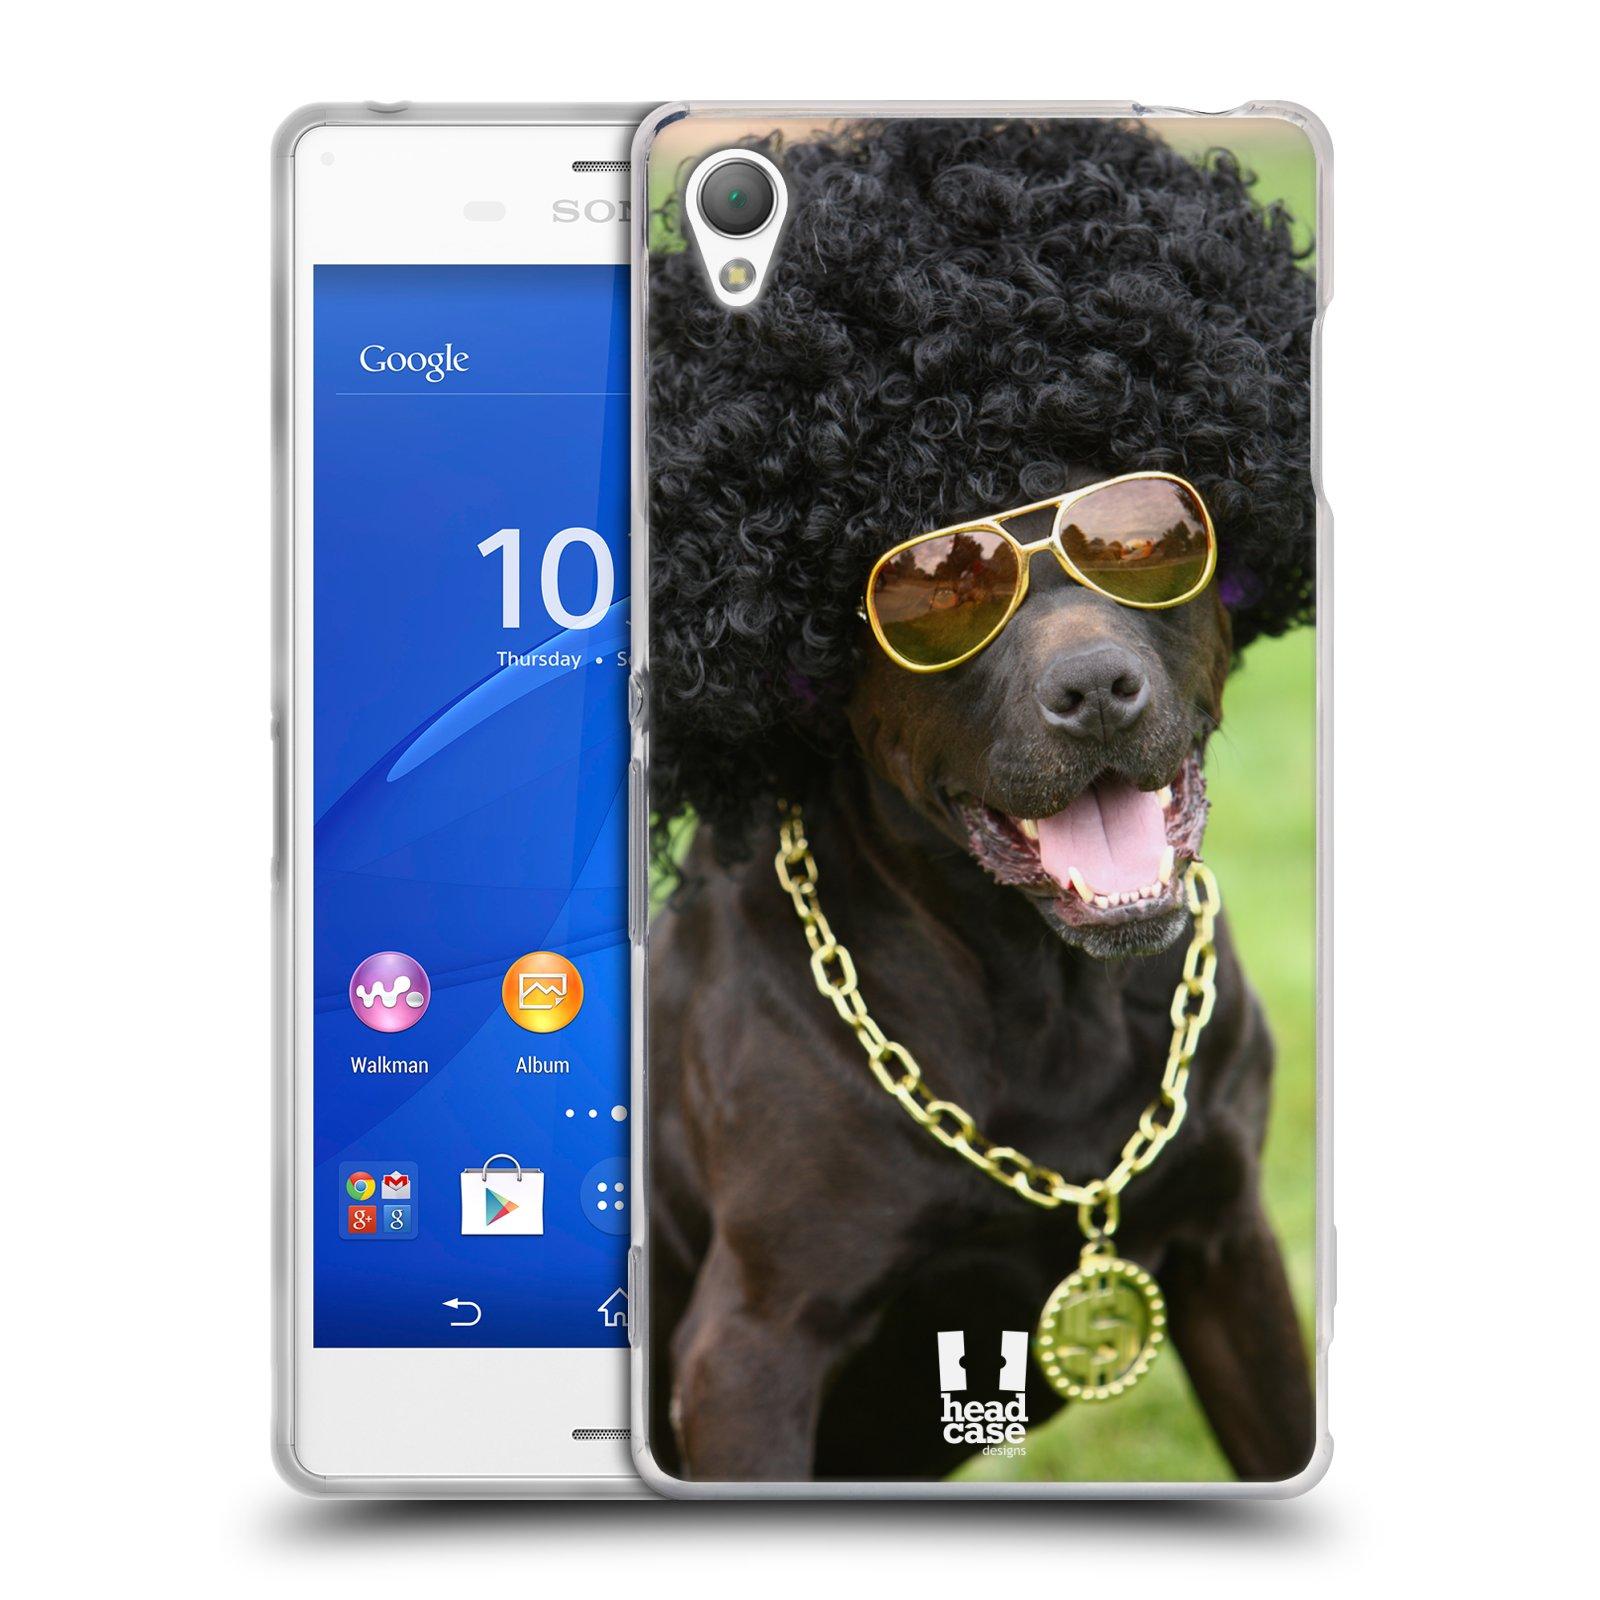 HEAD CASE silikonový obal na mobil Sony Xperia Z3 vzor Legrační zvířátka pejsek boháč